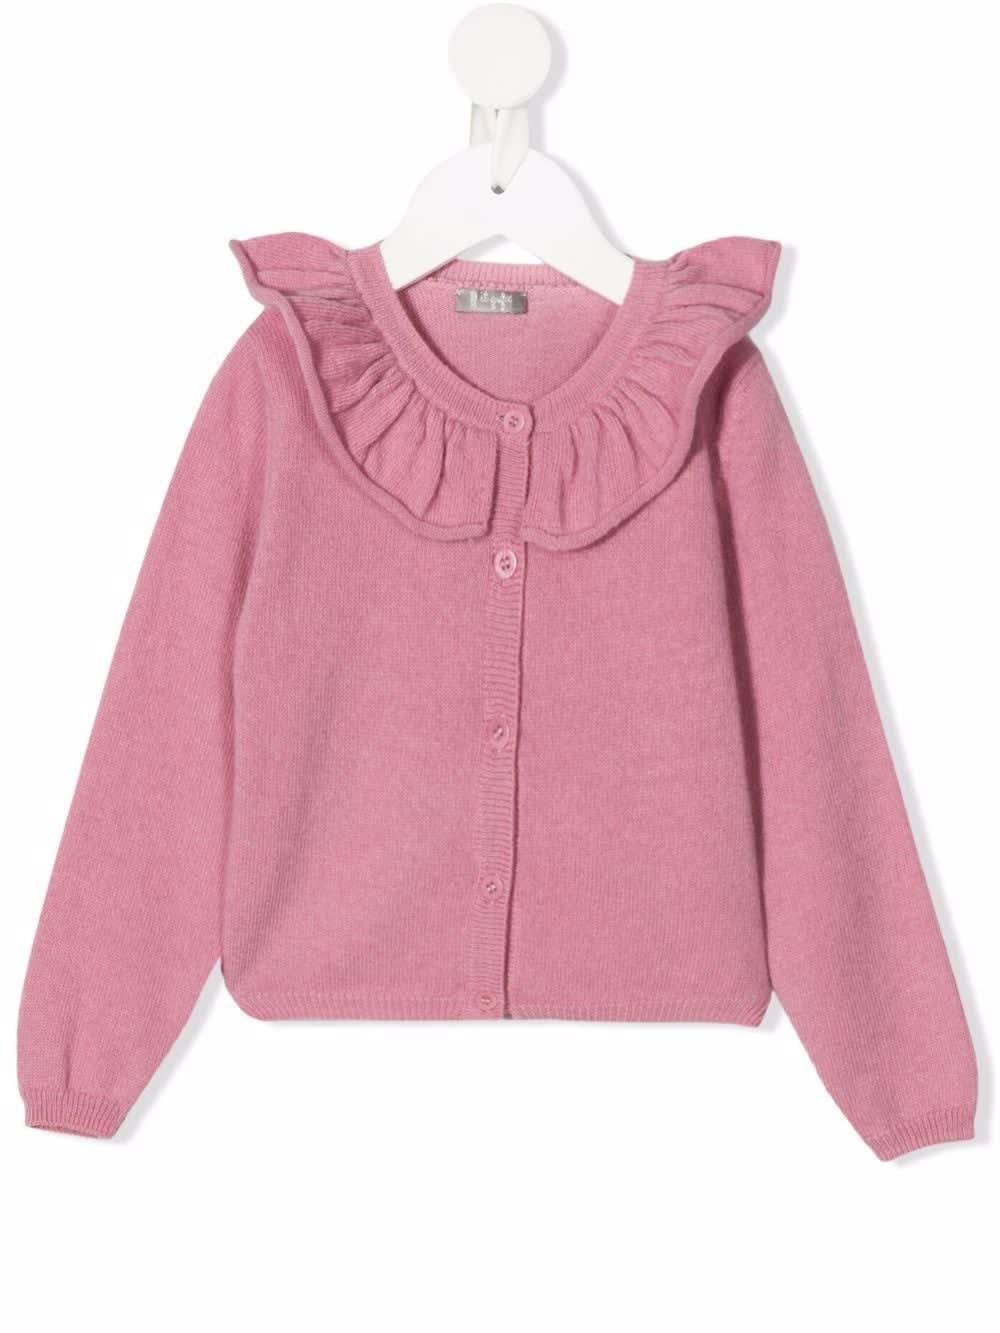 Kids Pink Wool Cardigan With Maxi Ruffles